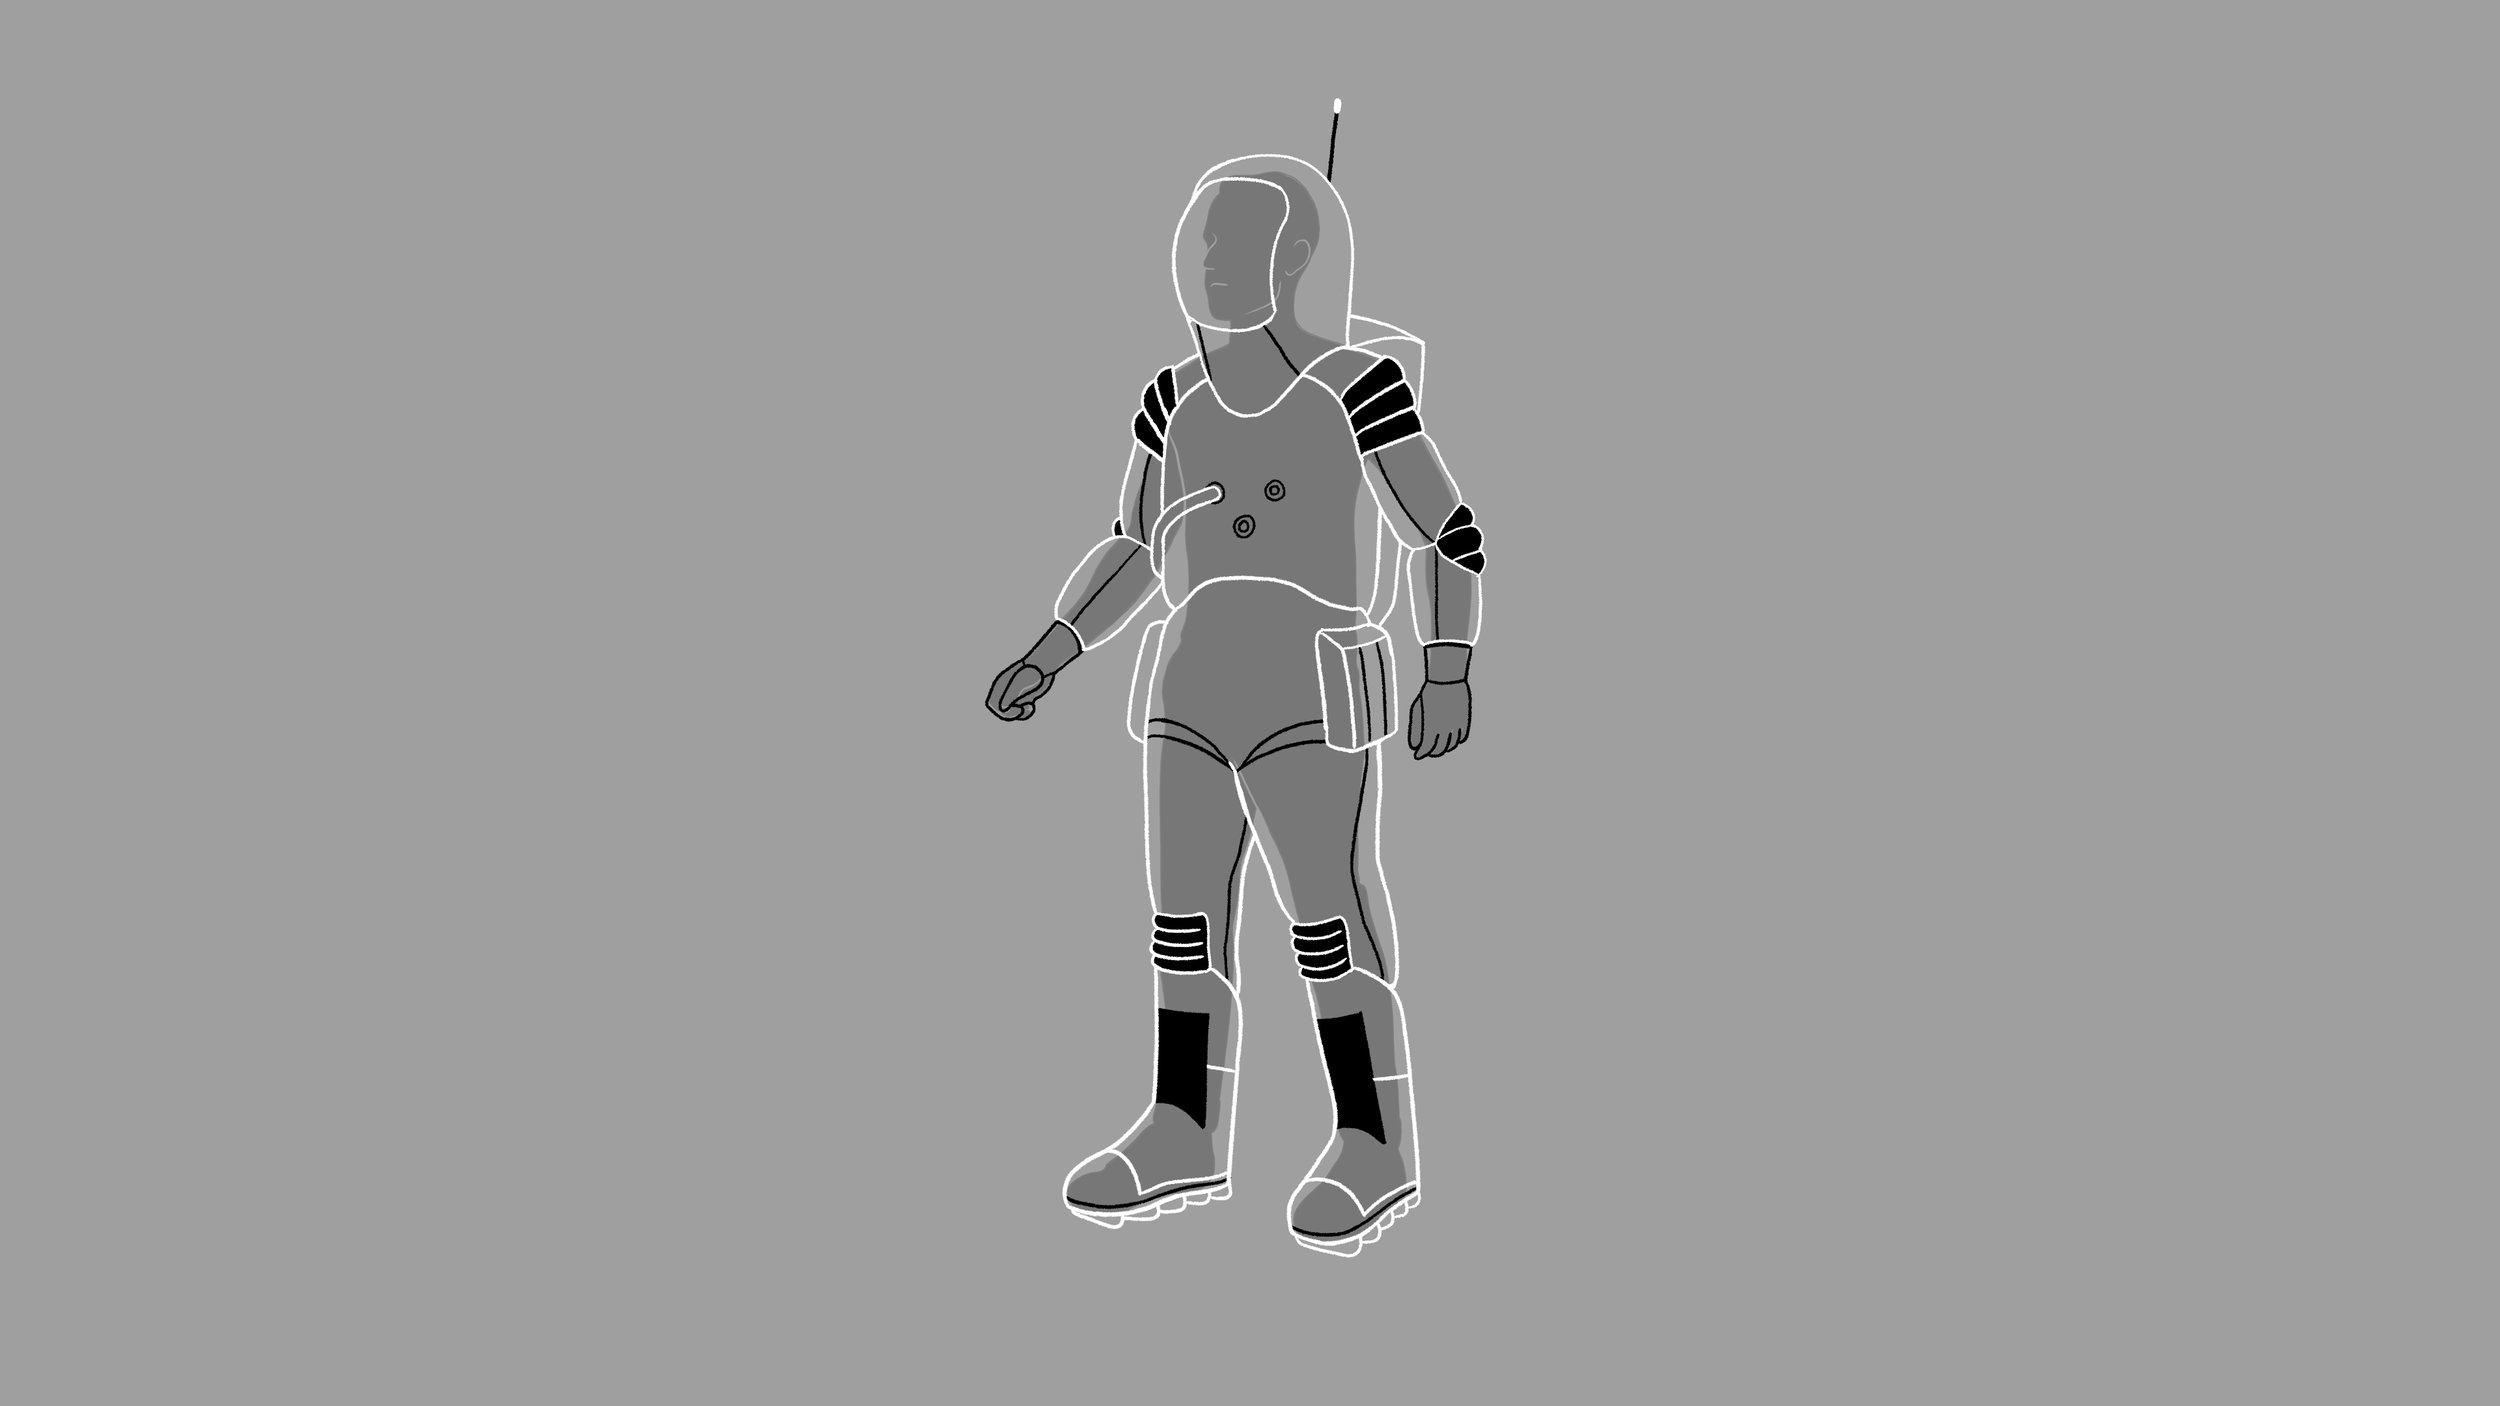 Oreo_Kid_Inside_Astronaut_011.jpg